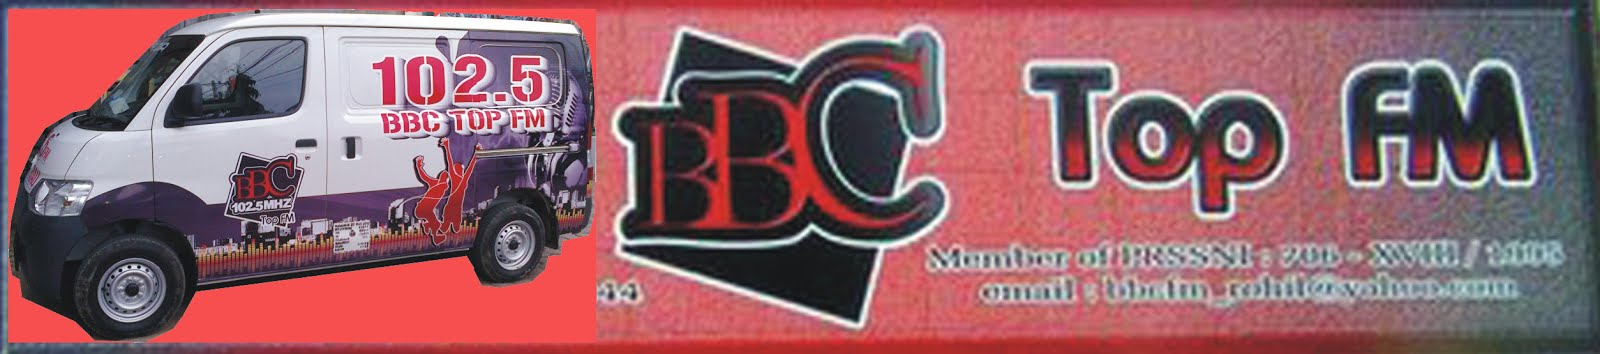 RADIO BBC 102.5 FM BAGAN BATU